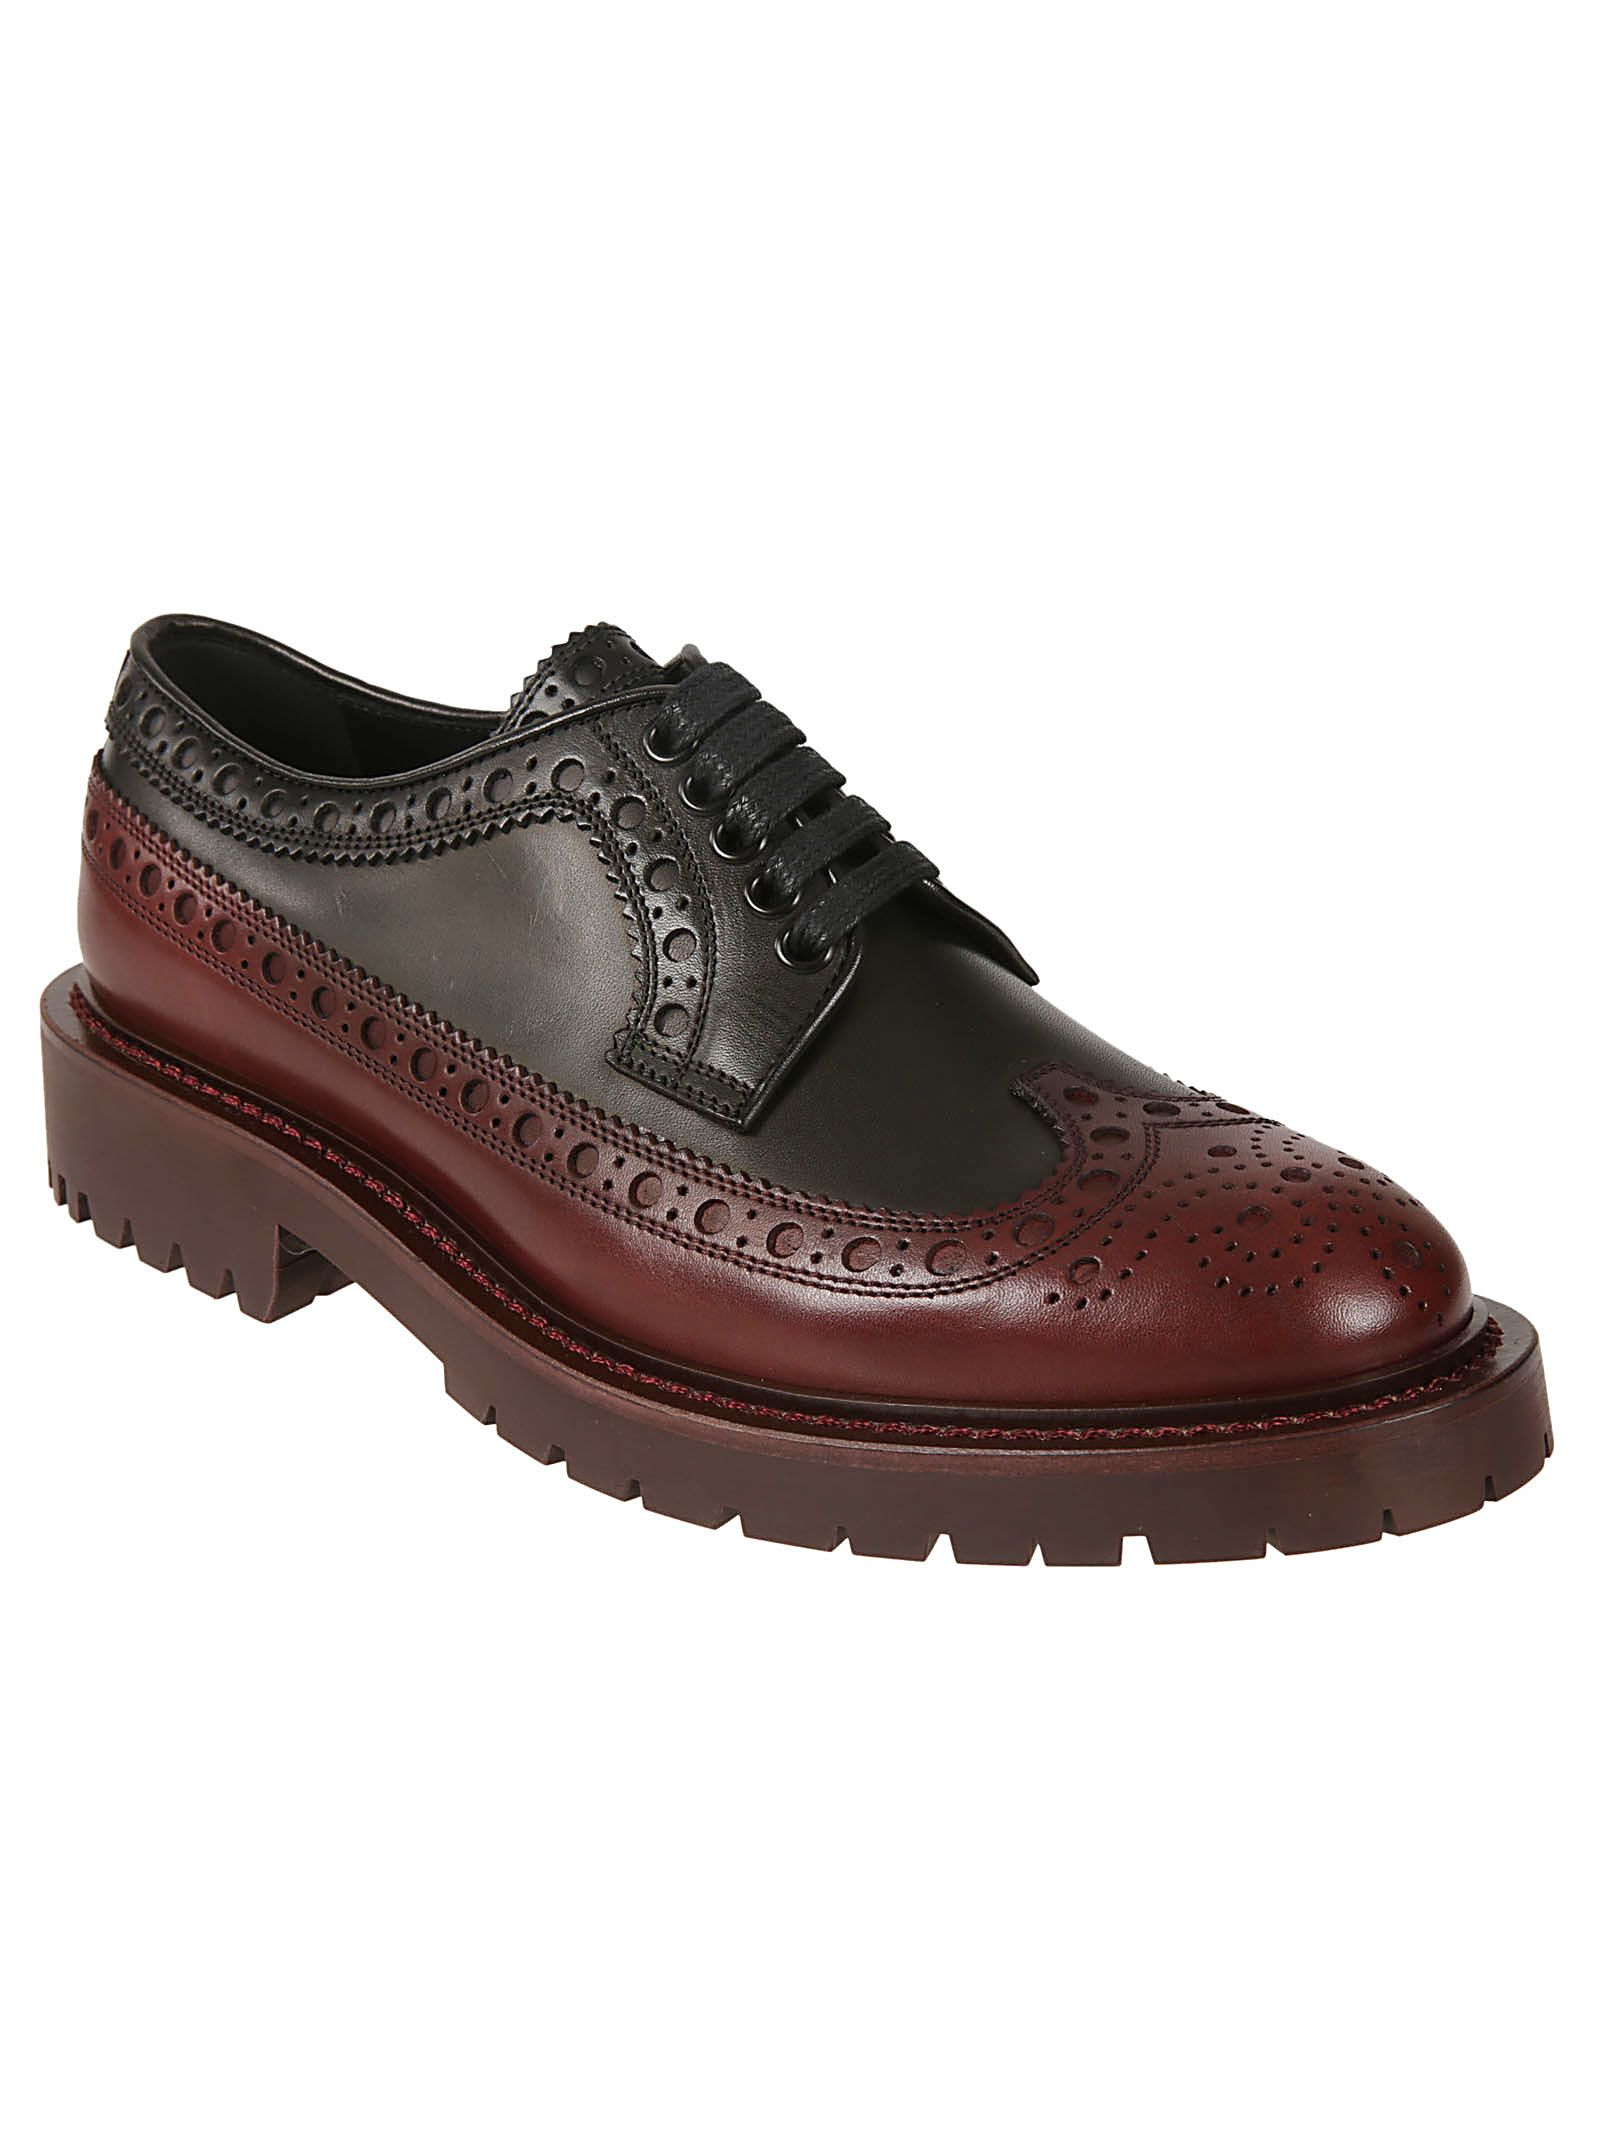 39b47b9ffba4 Burberry Burberry Brogue Detailed Derby Shoes - Black antique garnet ...